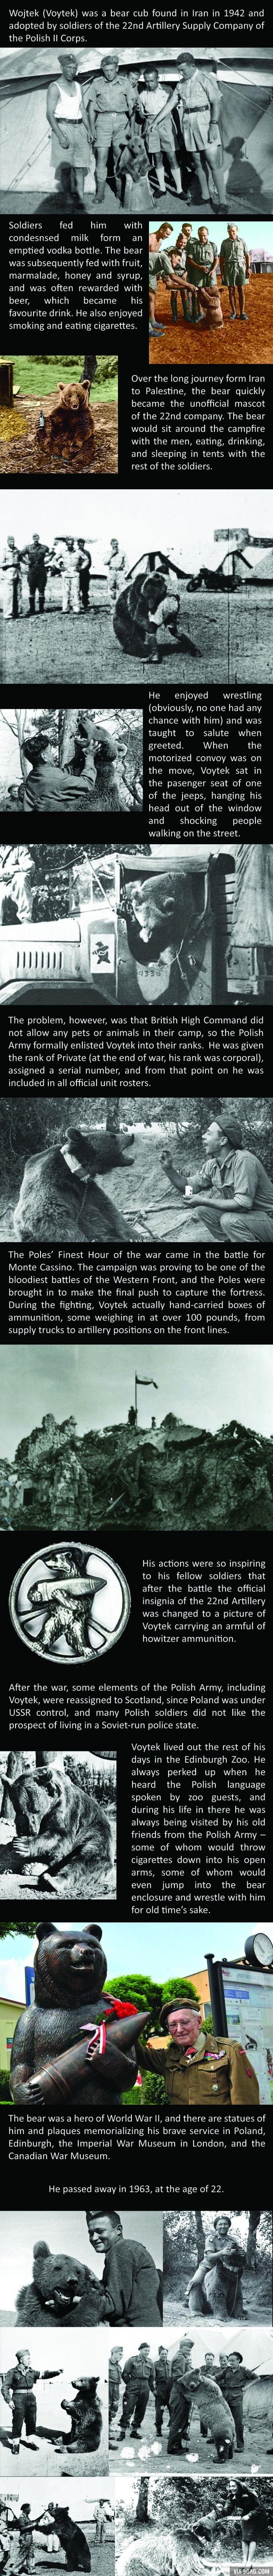 The amazing story of Voytek the Soldier Bear. https://en.wikipedia.org/wiki/Wojtek_(bear)